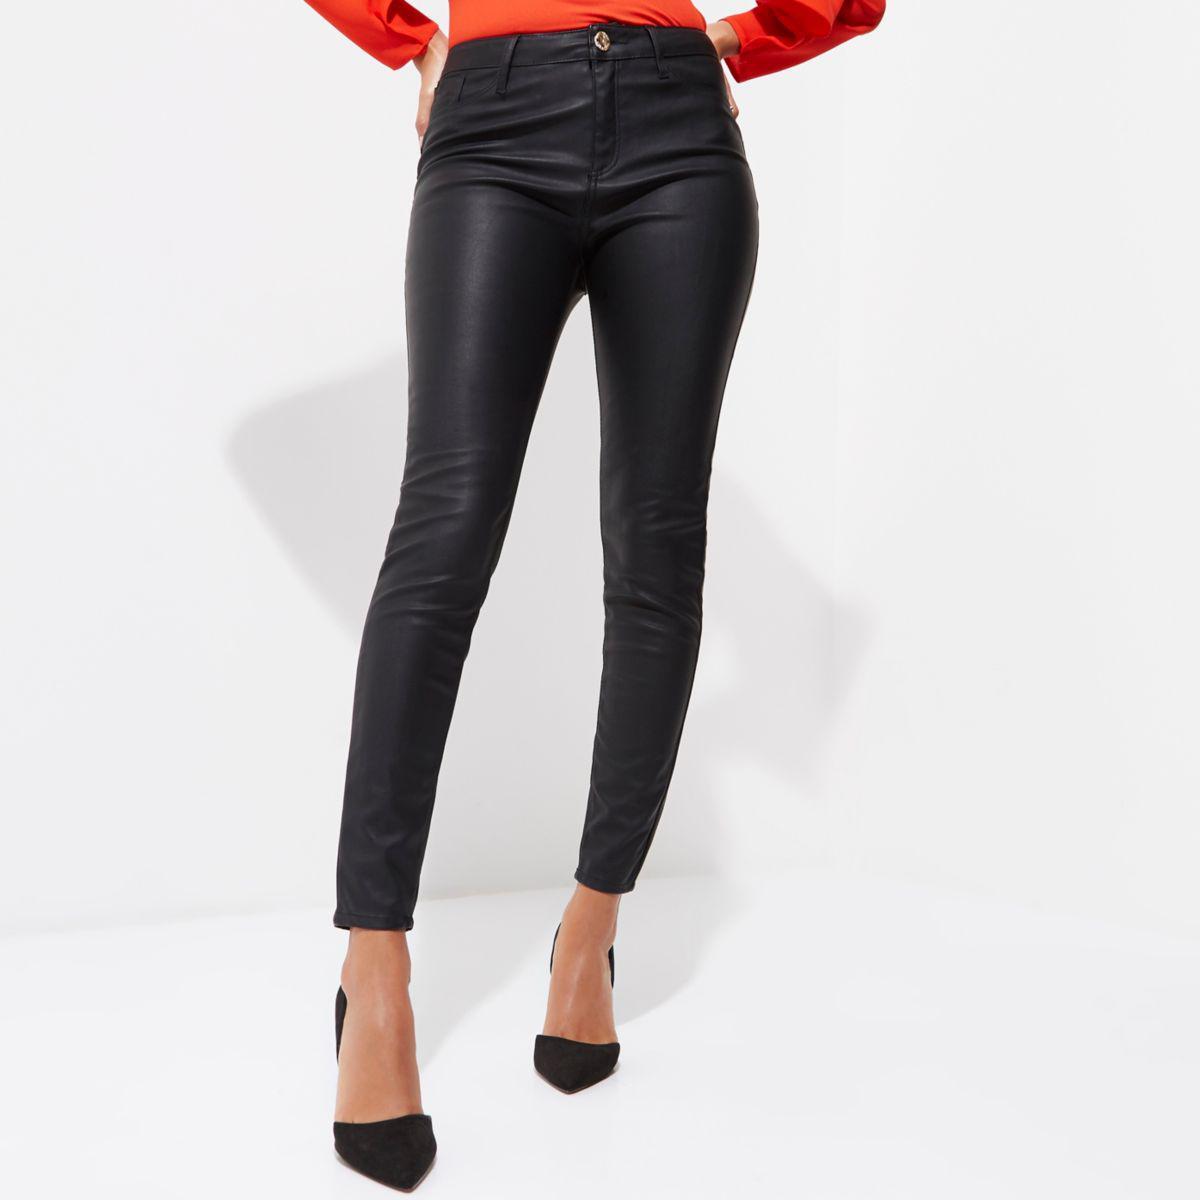 0e9de66753ba River Island Black Faux Leather Molly Skinny Fit Trousers Black Faux ...